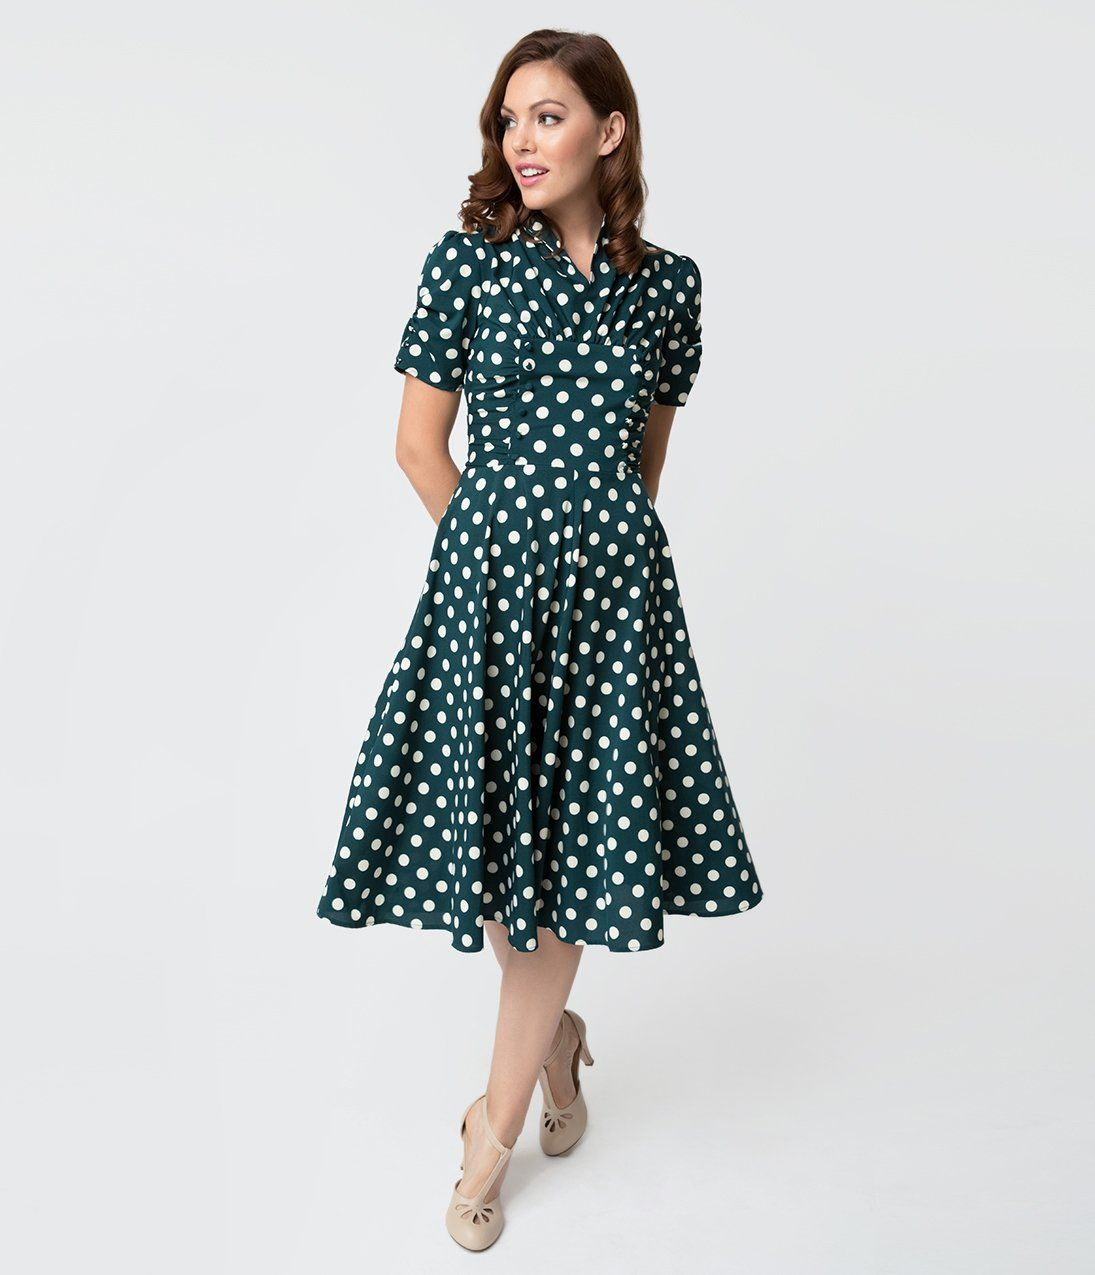 eba2c6a6a71f 1940s Dresses | 40s Dress, Swing Dress Unique Vintage 1940S Style Emerald  Green White Dot Camilla Midi Dress vintagedancer.com